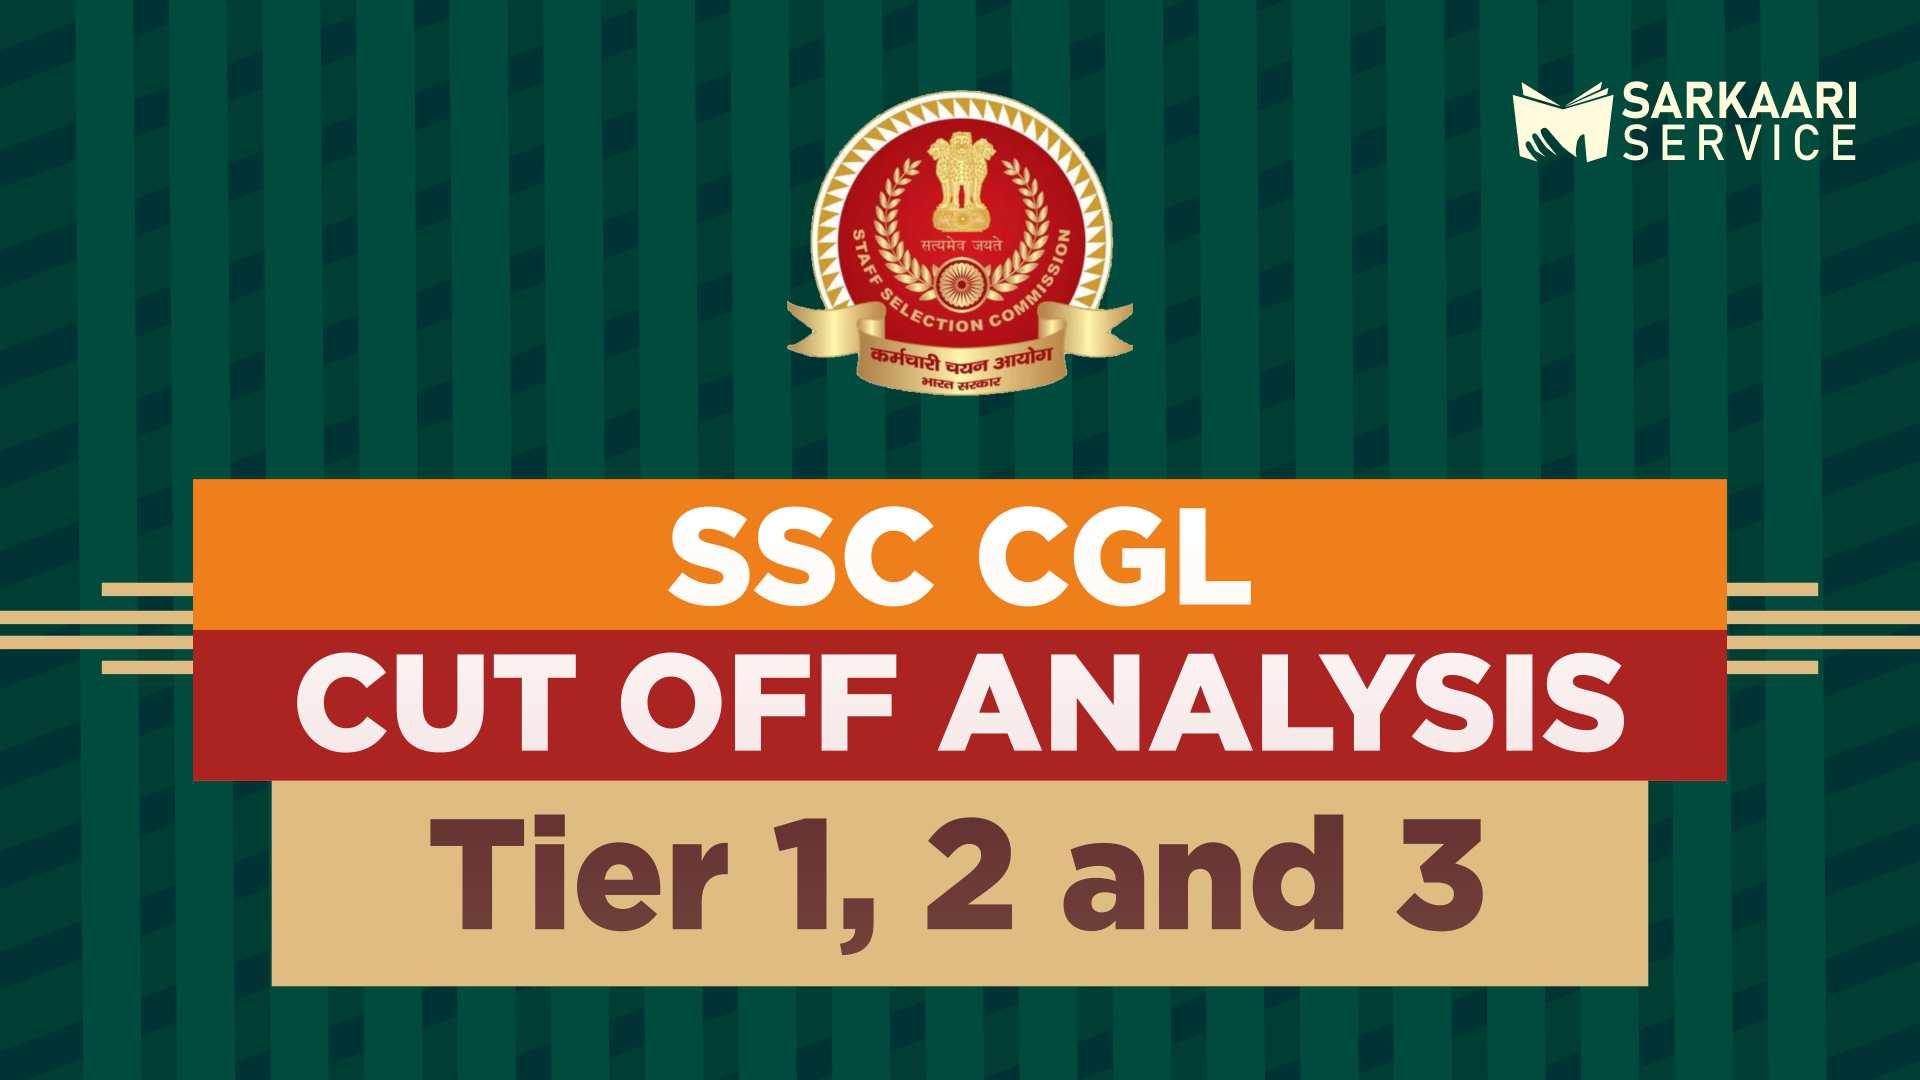 SSC CGL Cut off 2020